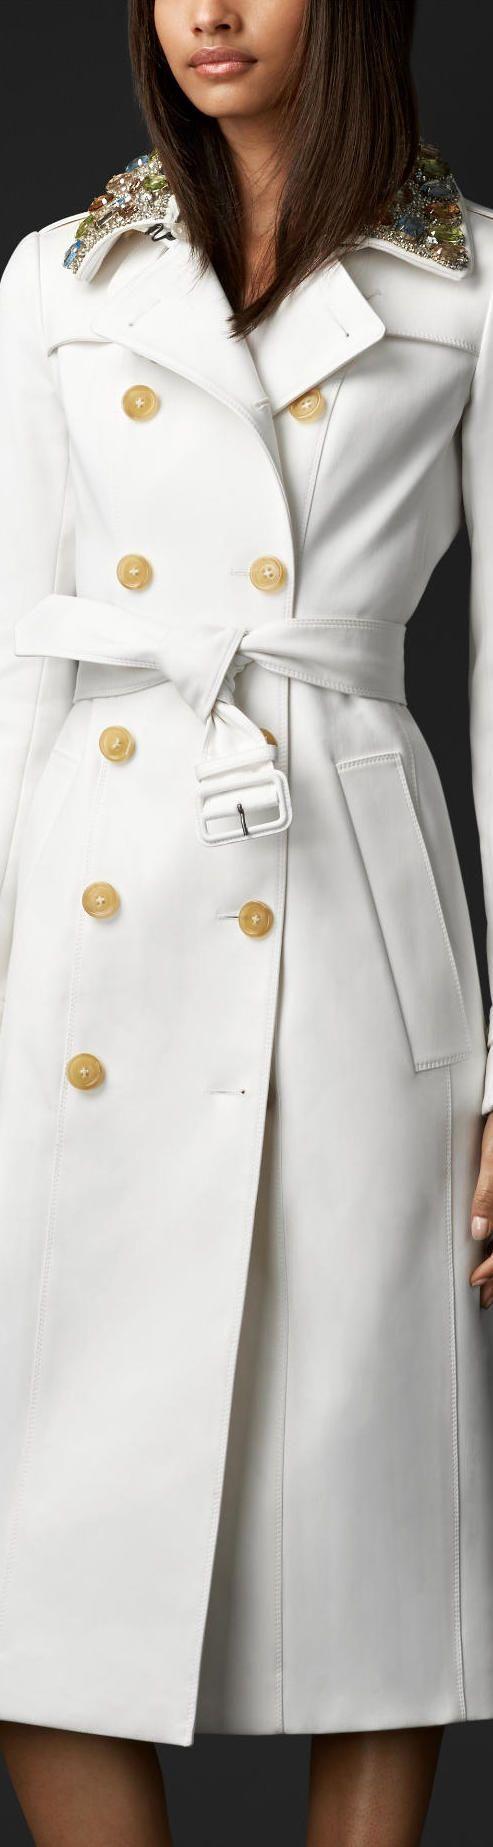 Burberry >> Gem Collar Trench Coat